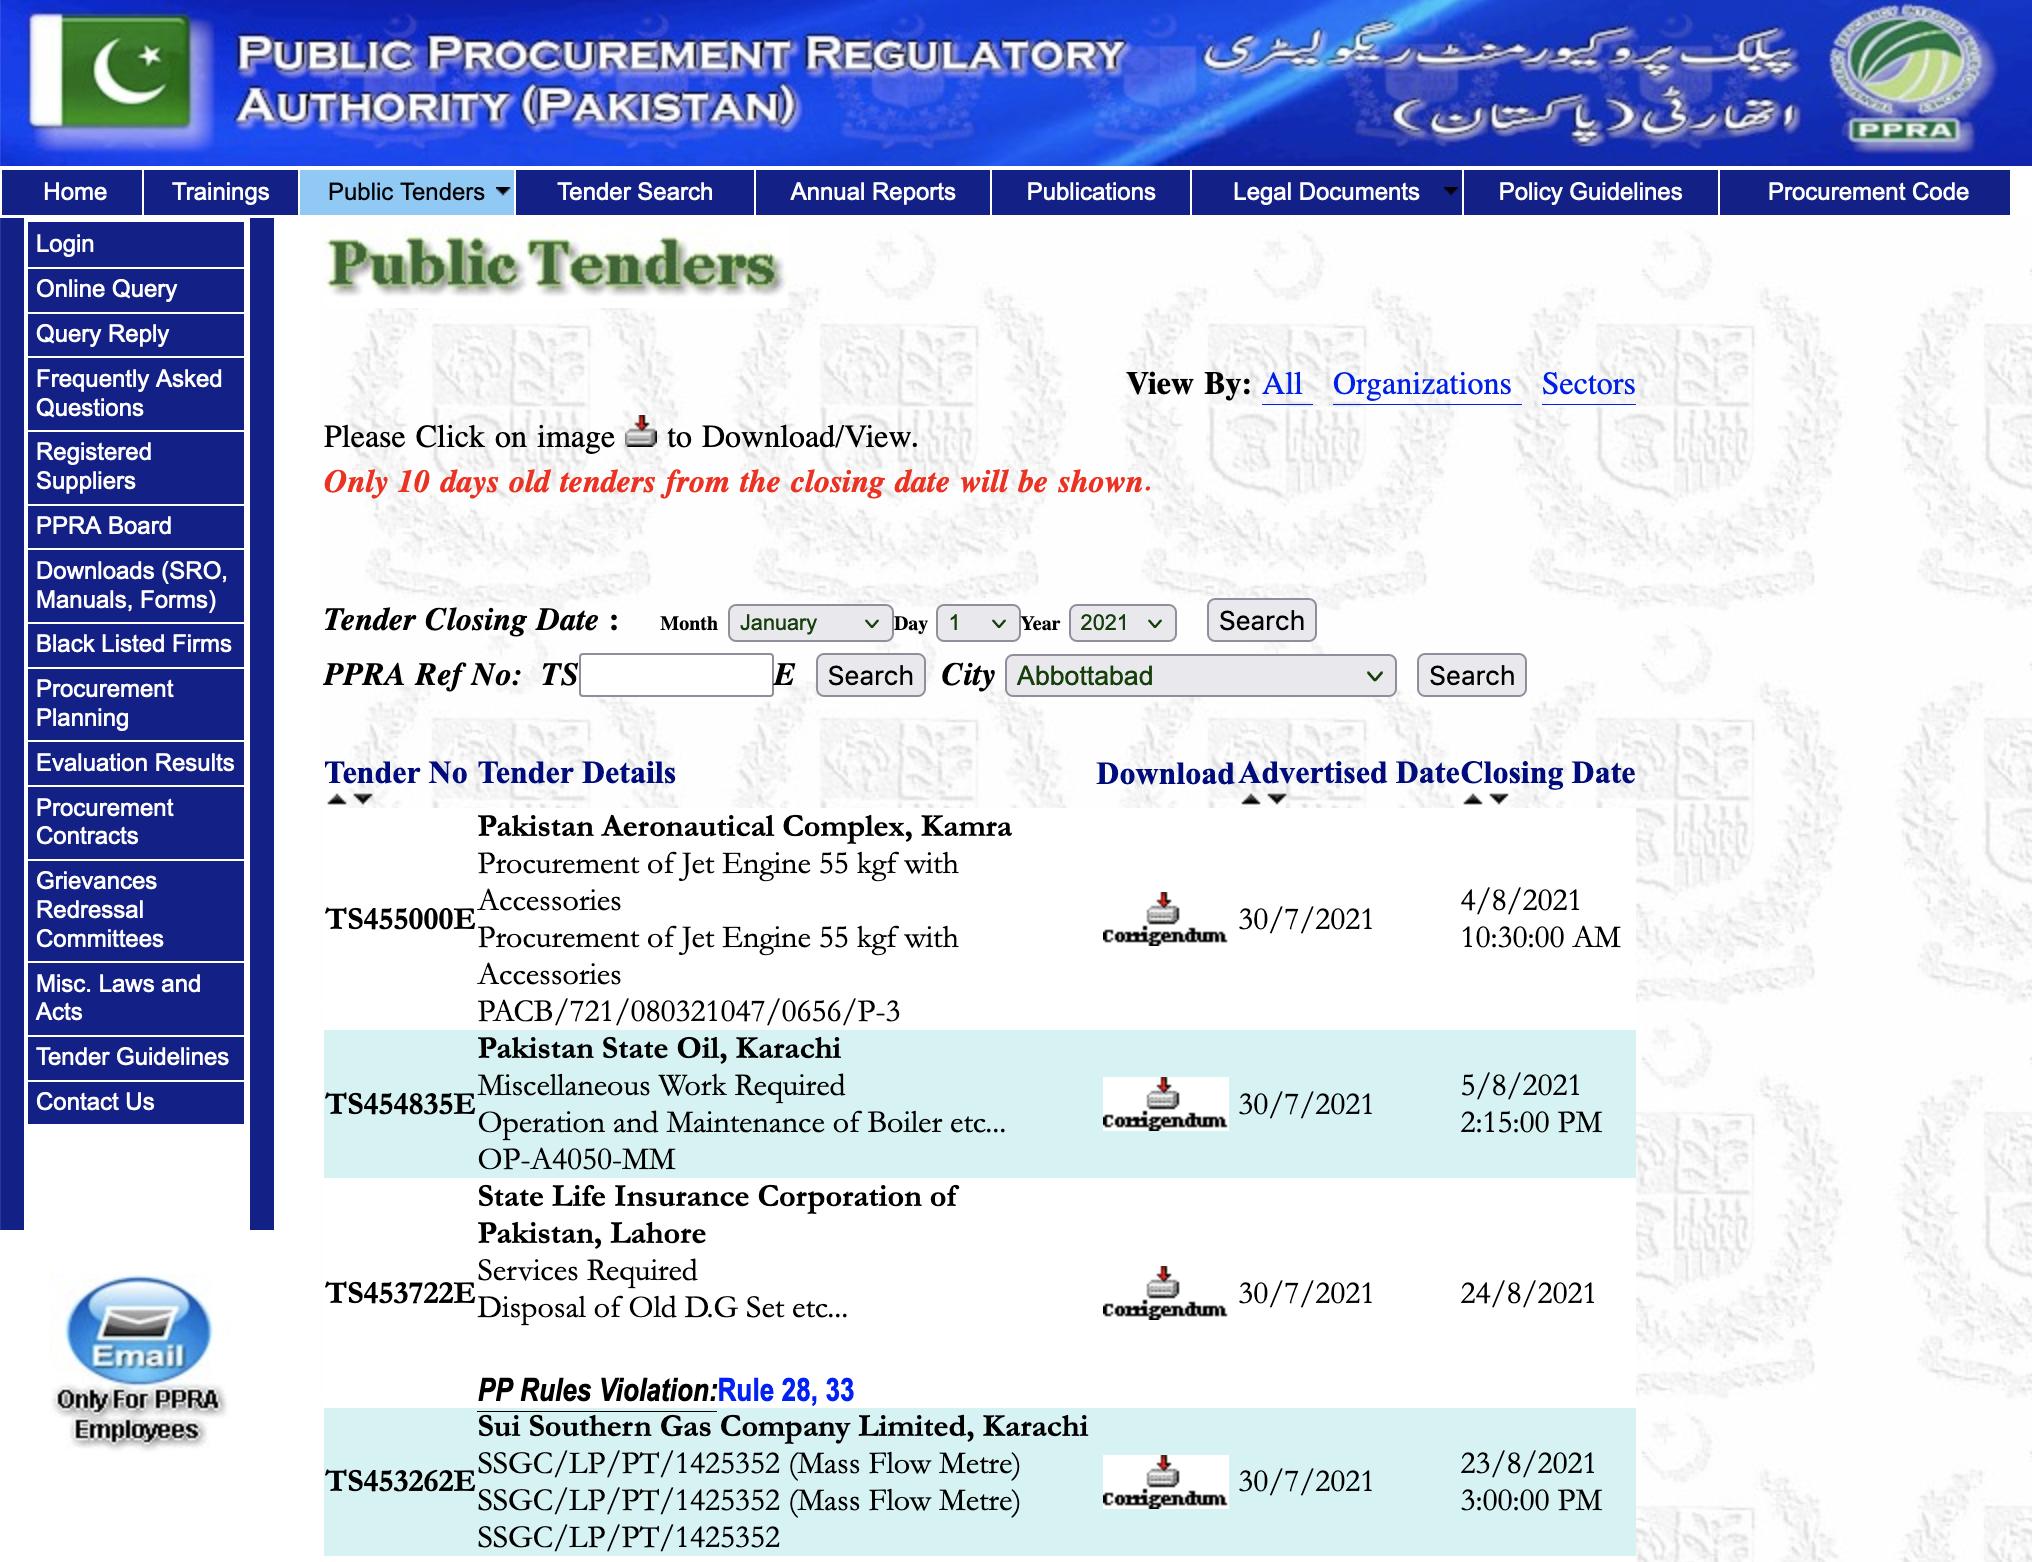 PPRA homepage